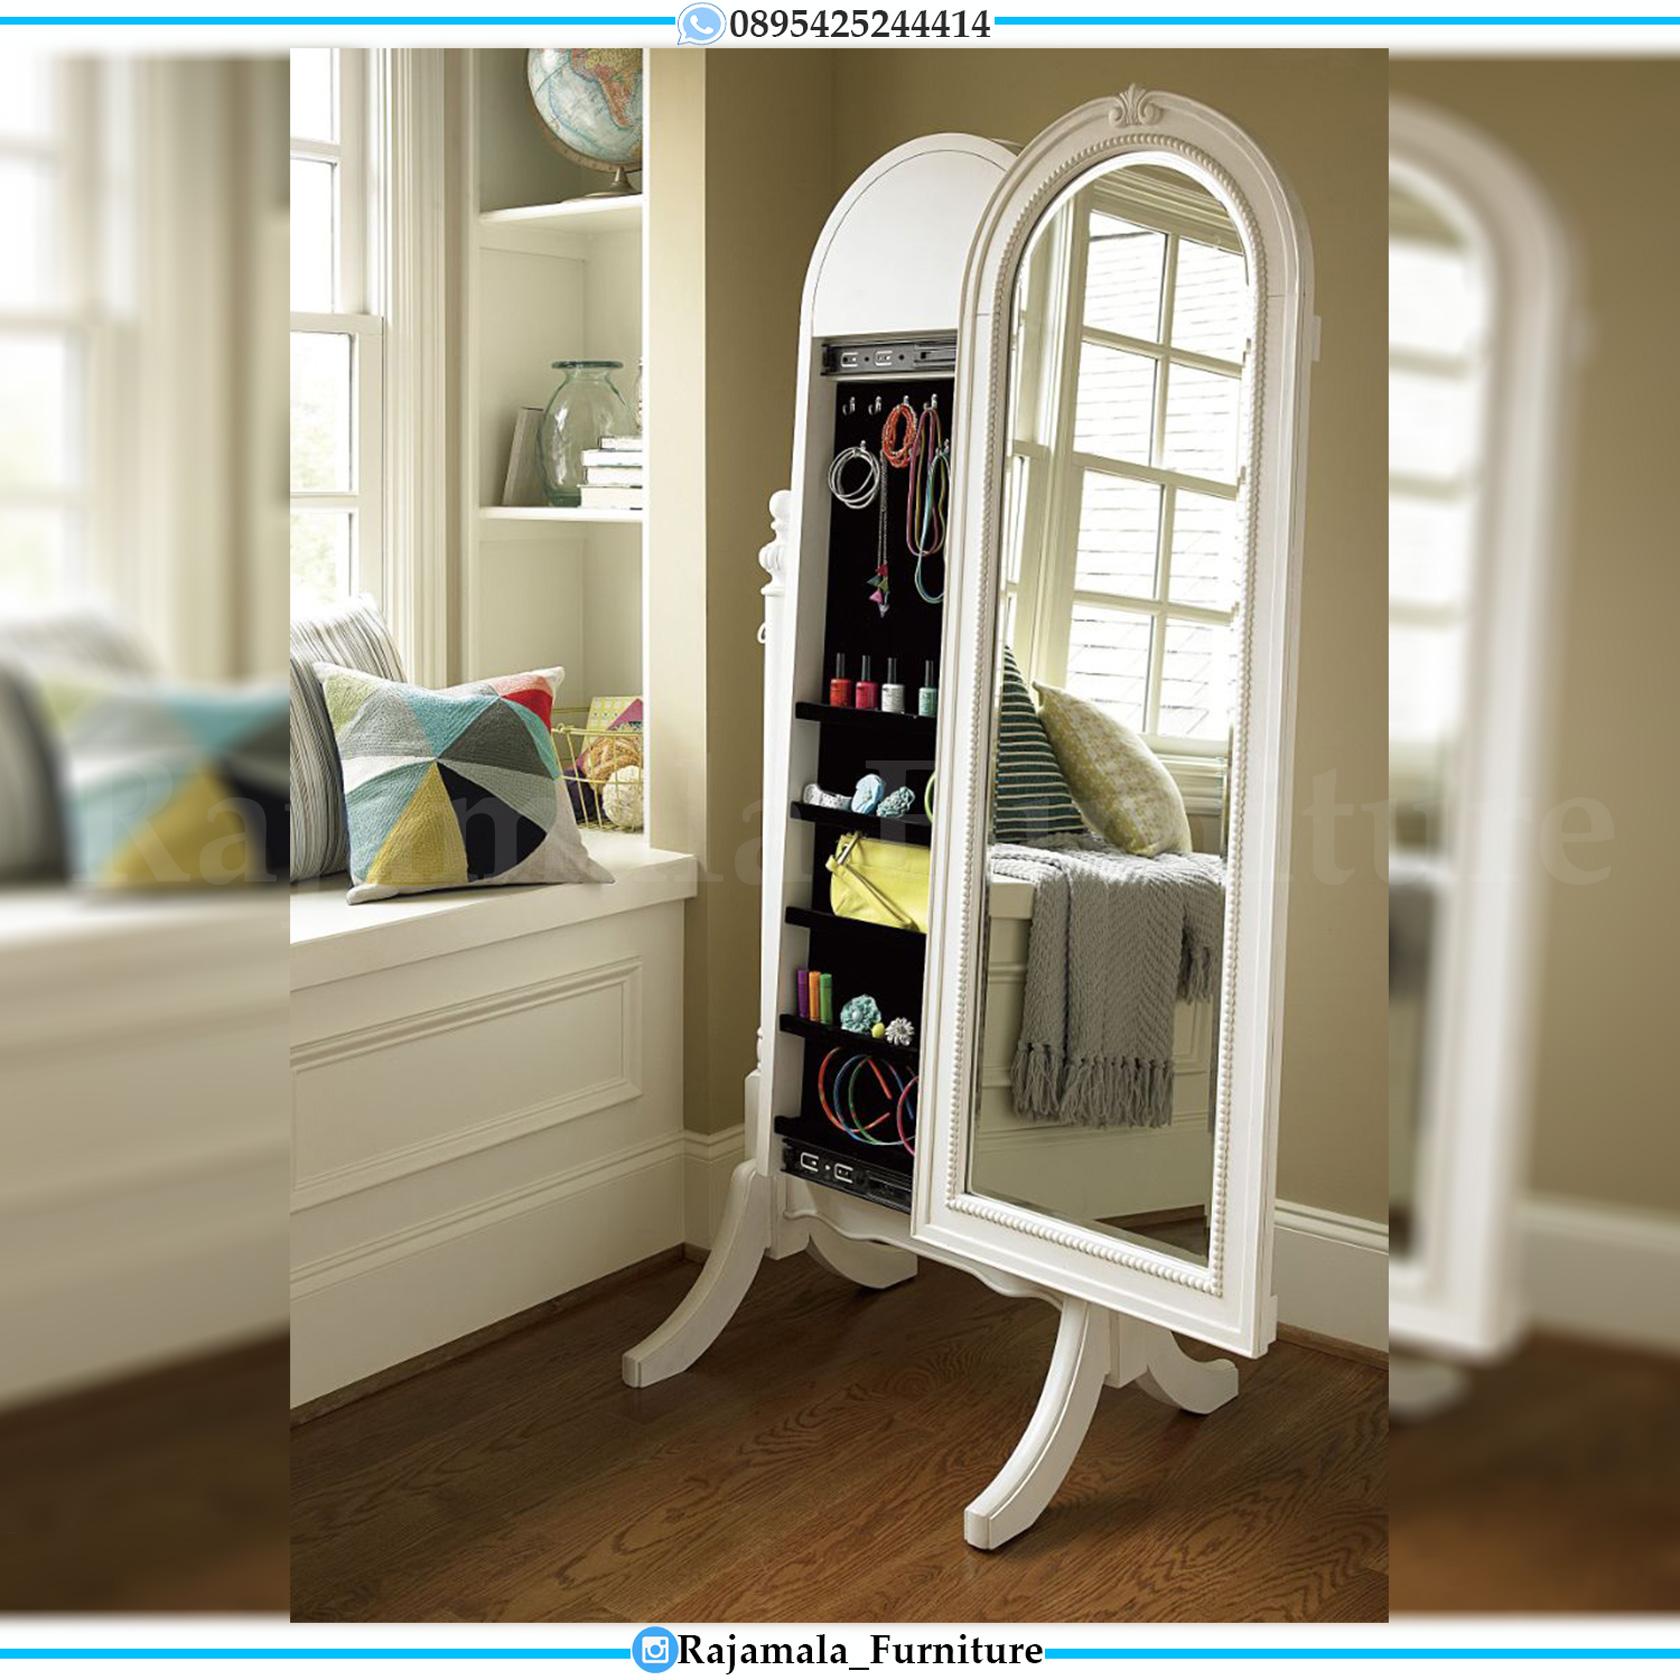 Stand Mirror Minimalis Make Up Set Cermin Rias Berdiri Desain Terbaru RM-0052